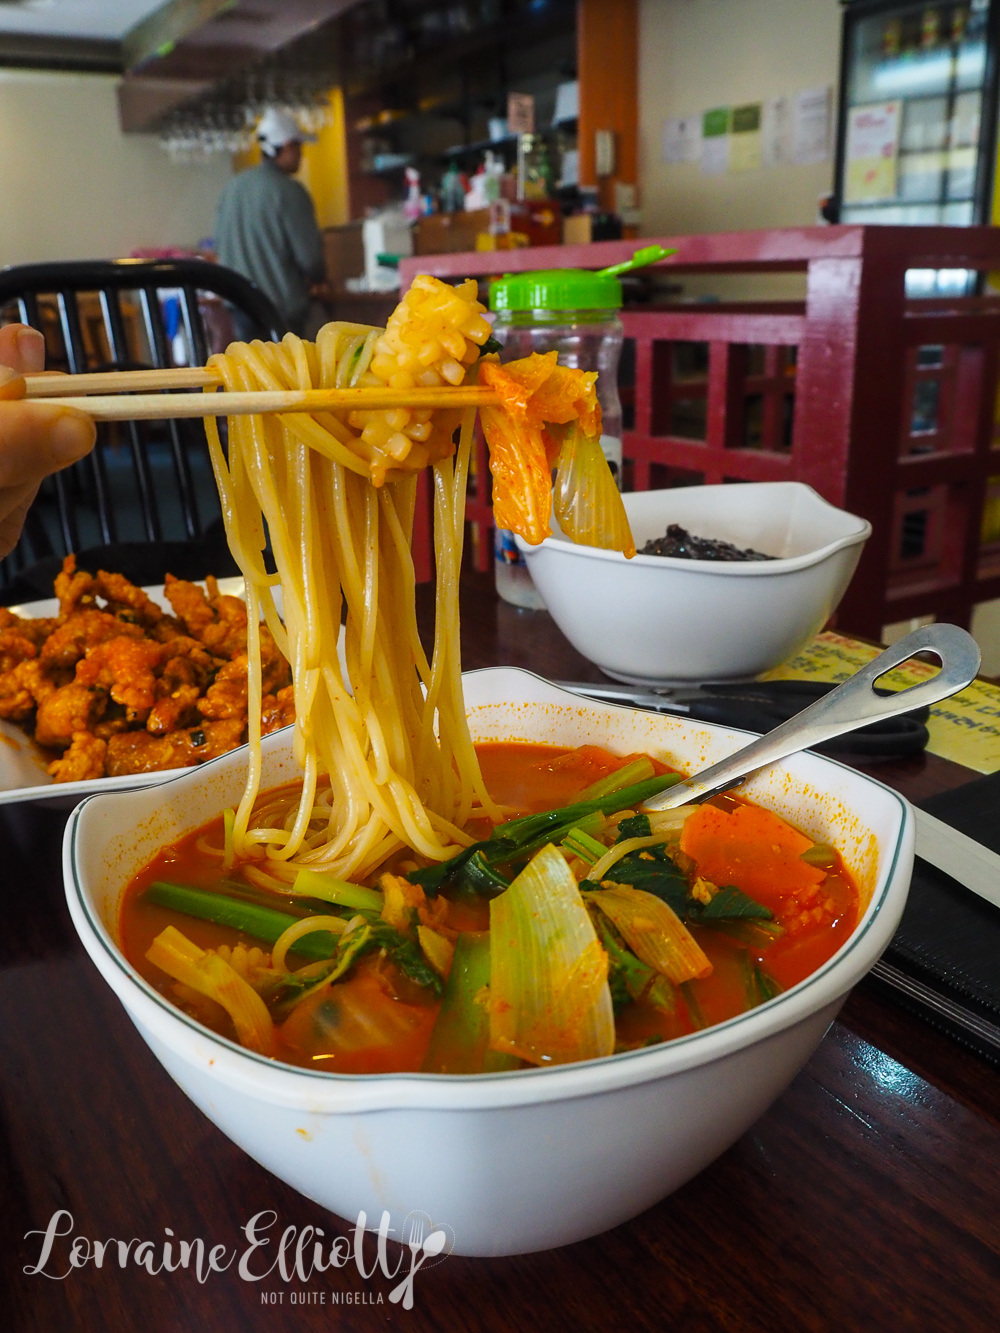 yang tz chinese restaurant eastwood  not quite nigella